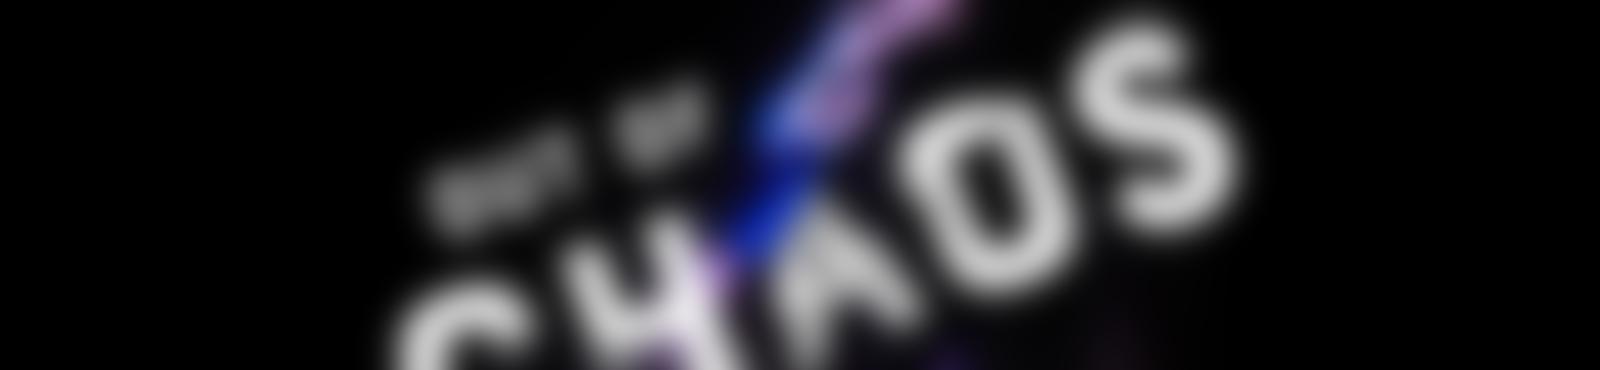 Blurred 2013b956 c0b2 496a bba4 ba818e4924d2